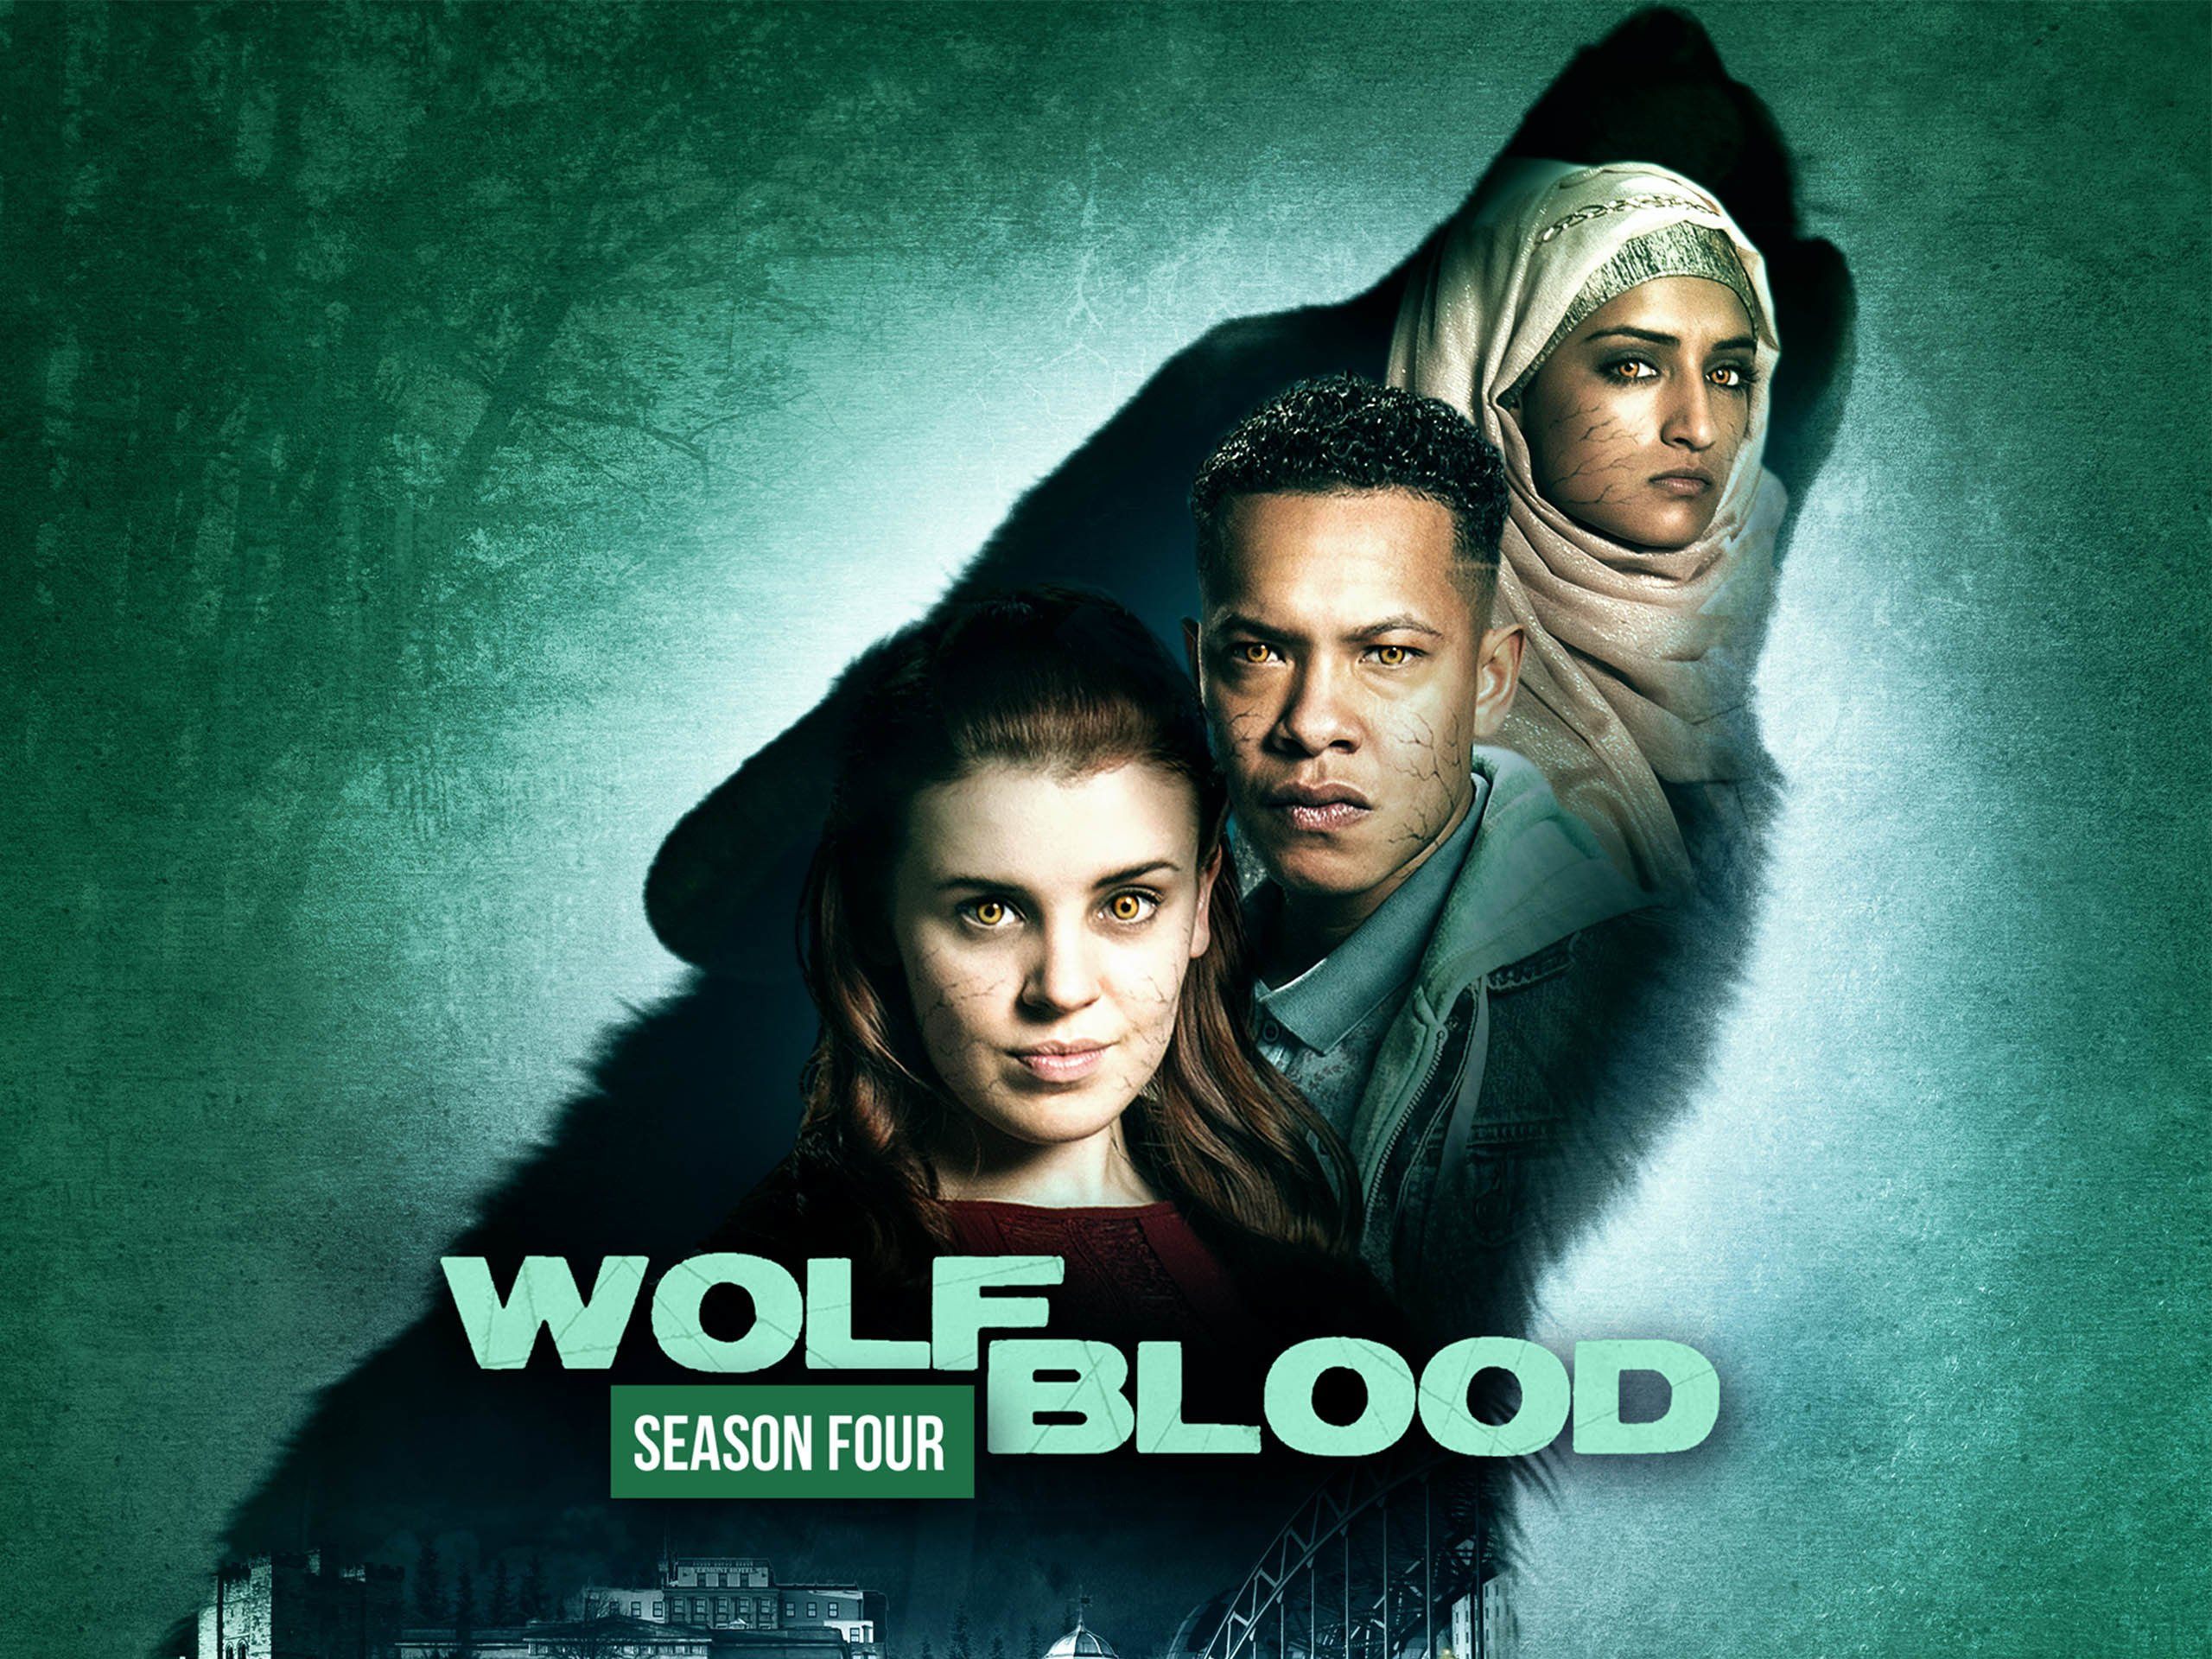 Wolfblood, Season 4